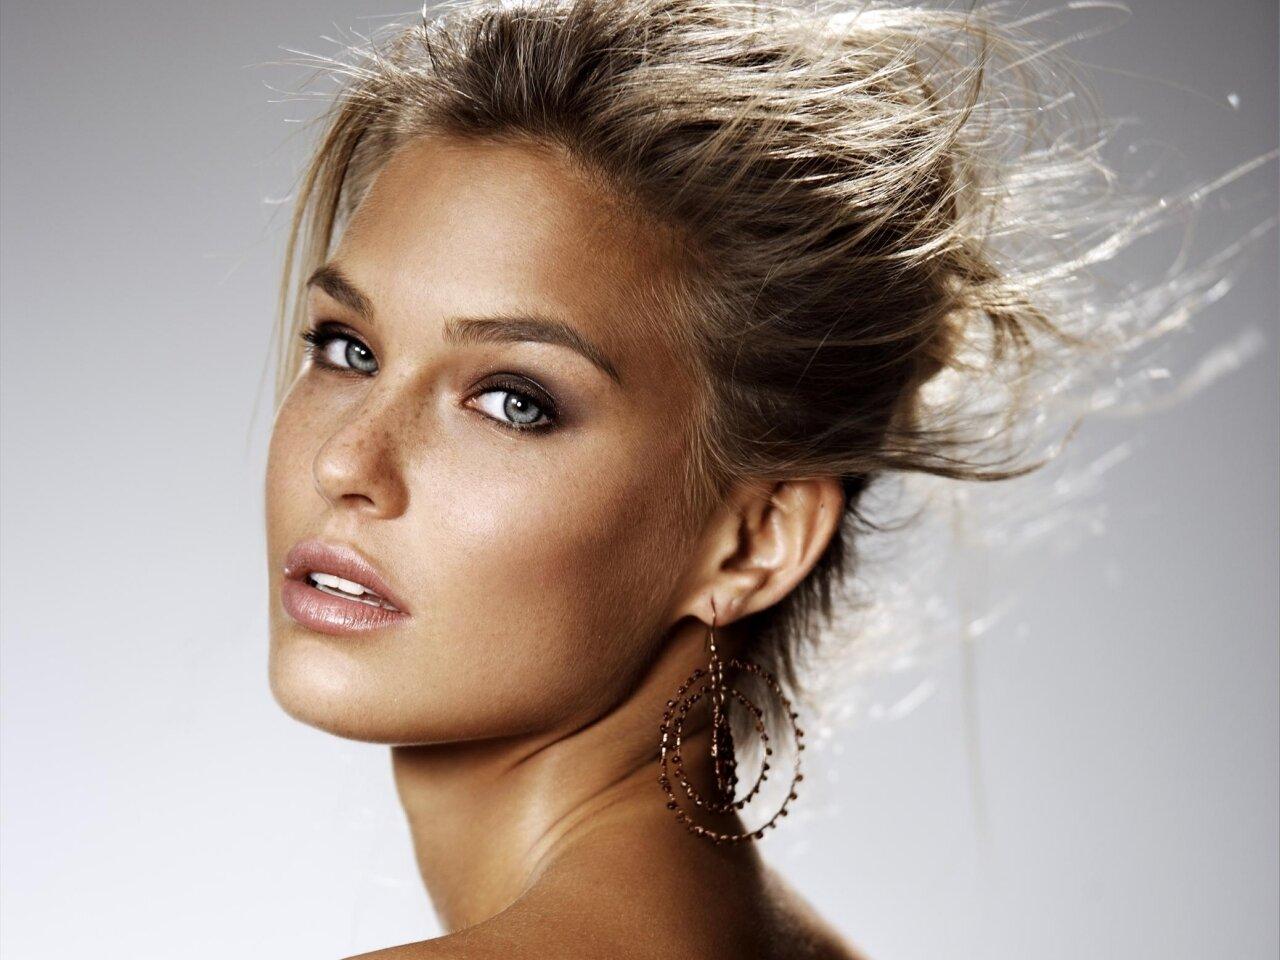 women jewish model nude